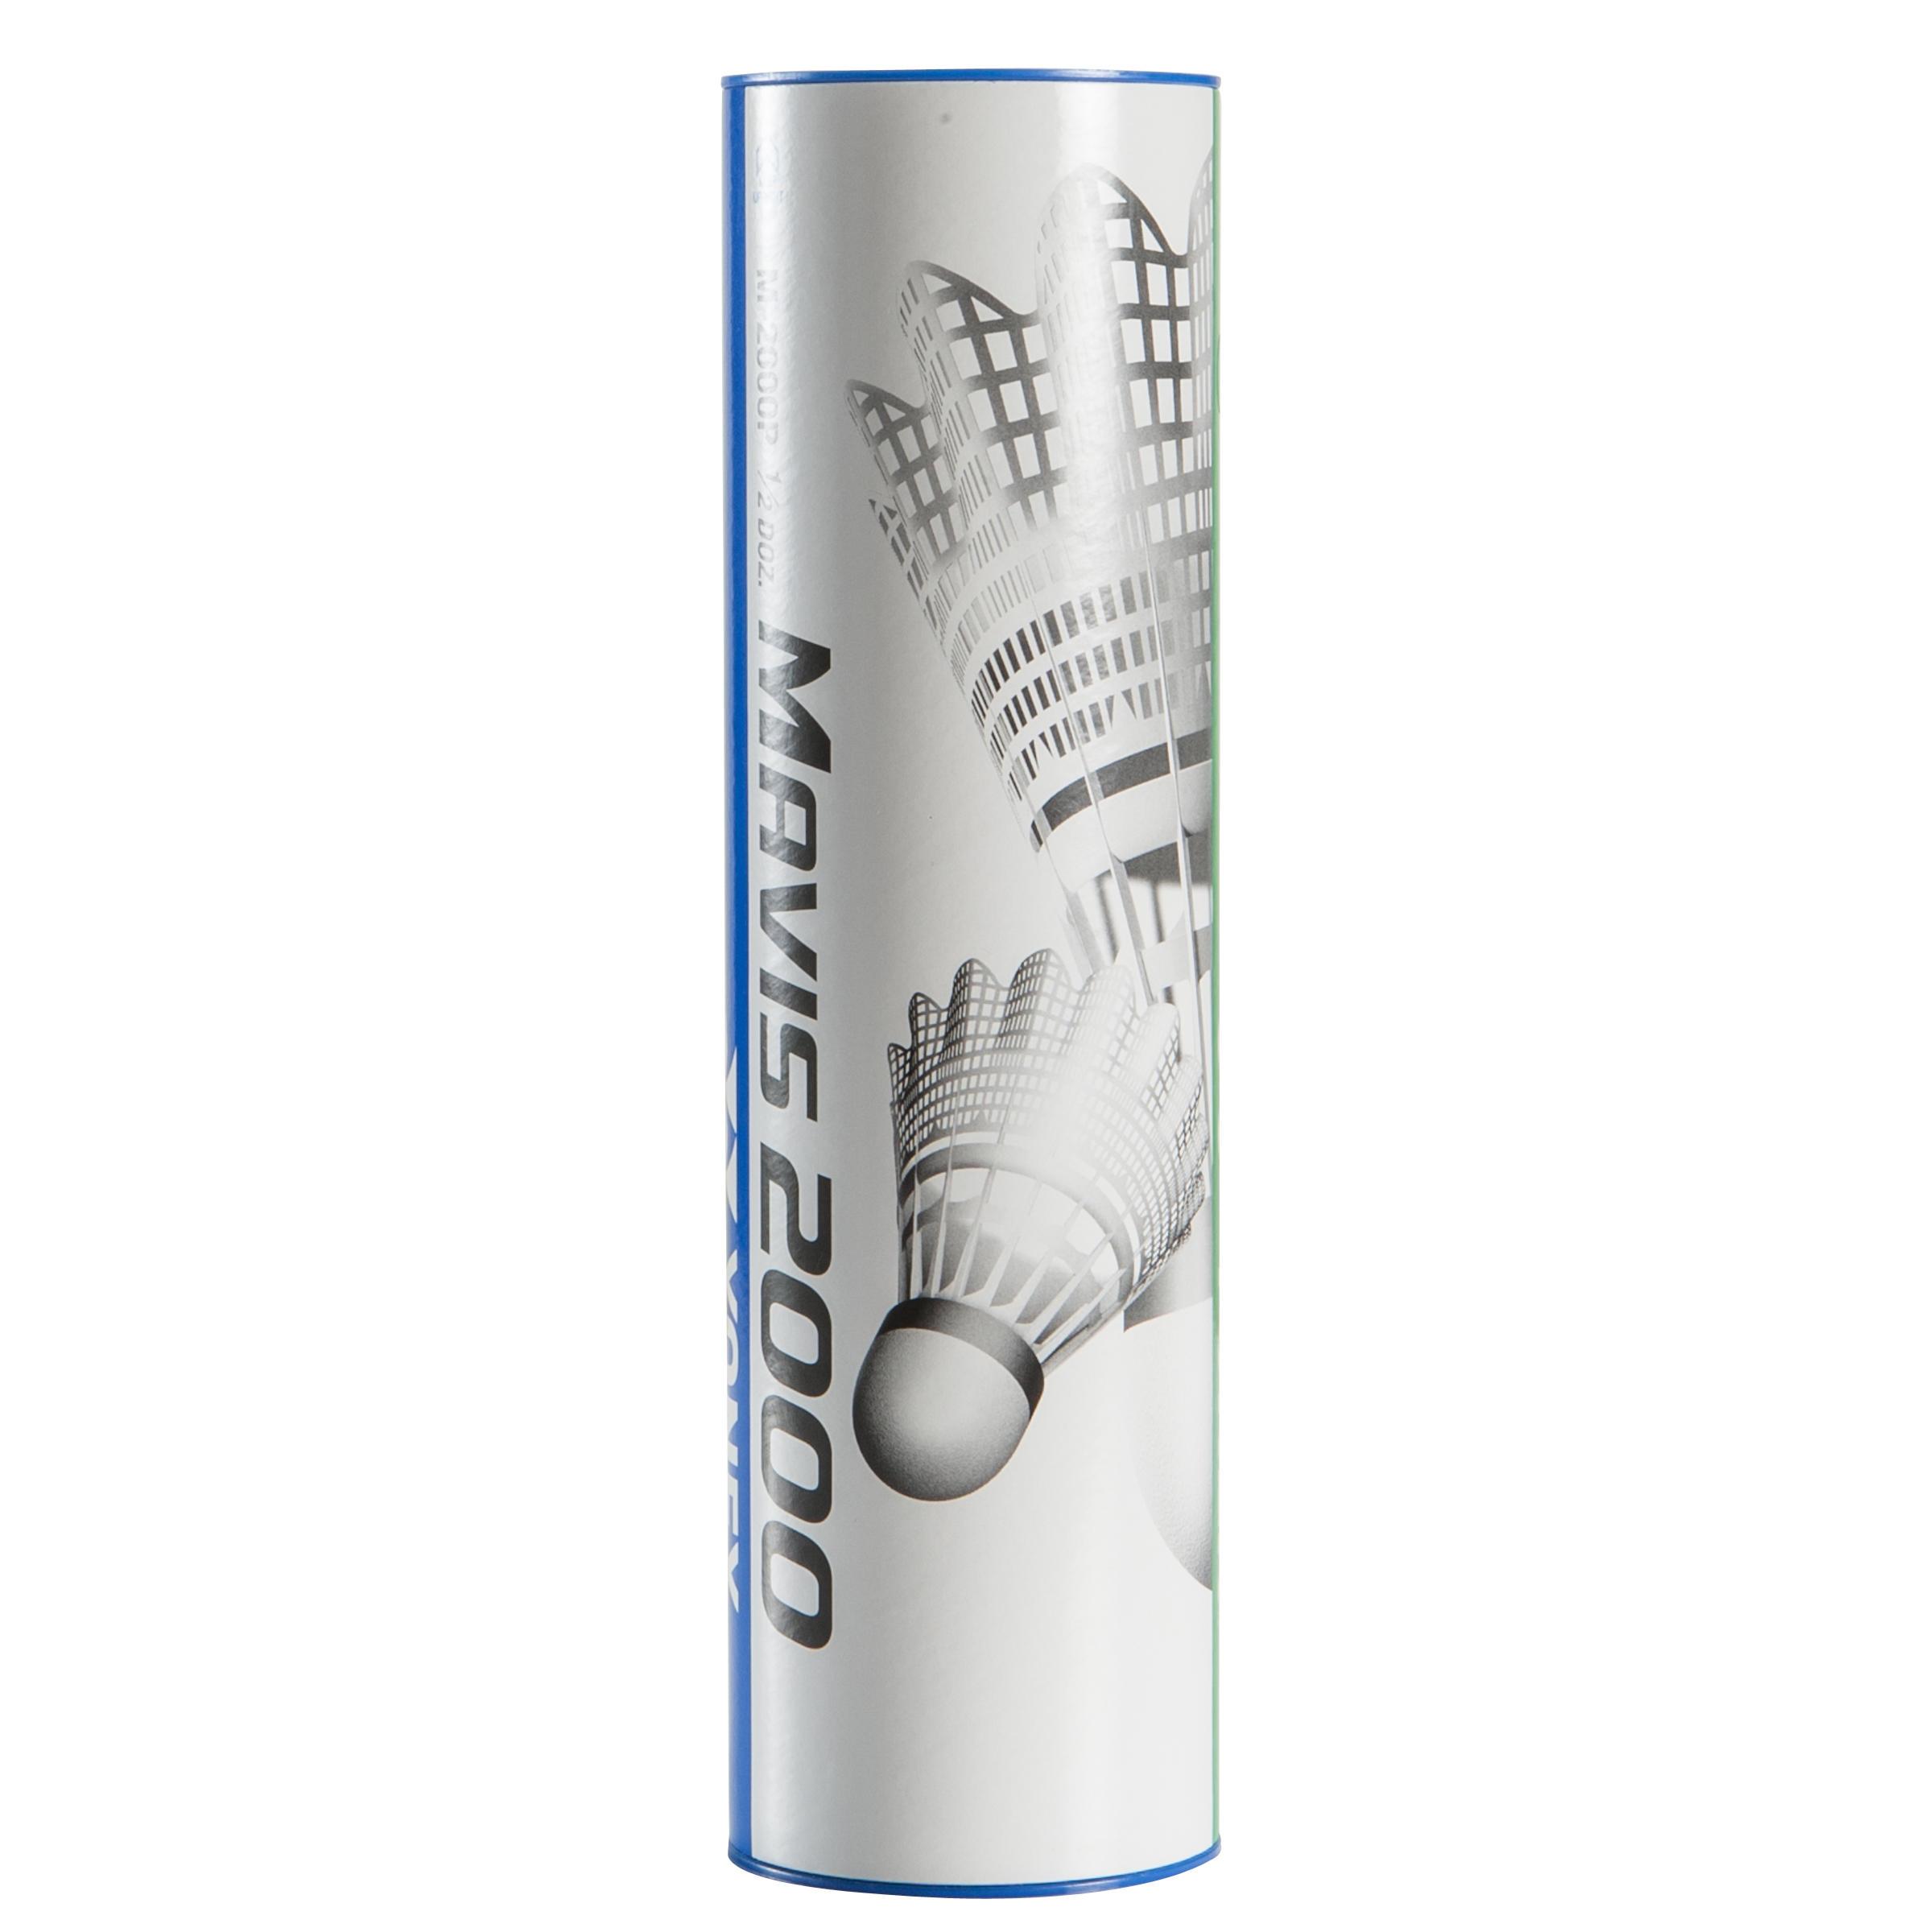 Yonex Badmintonshuttle Mavis 2000 wit set van 6